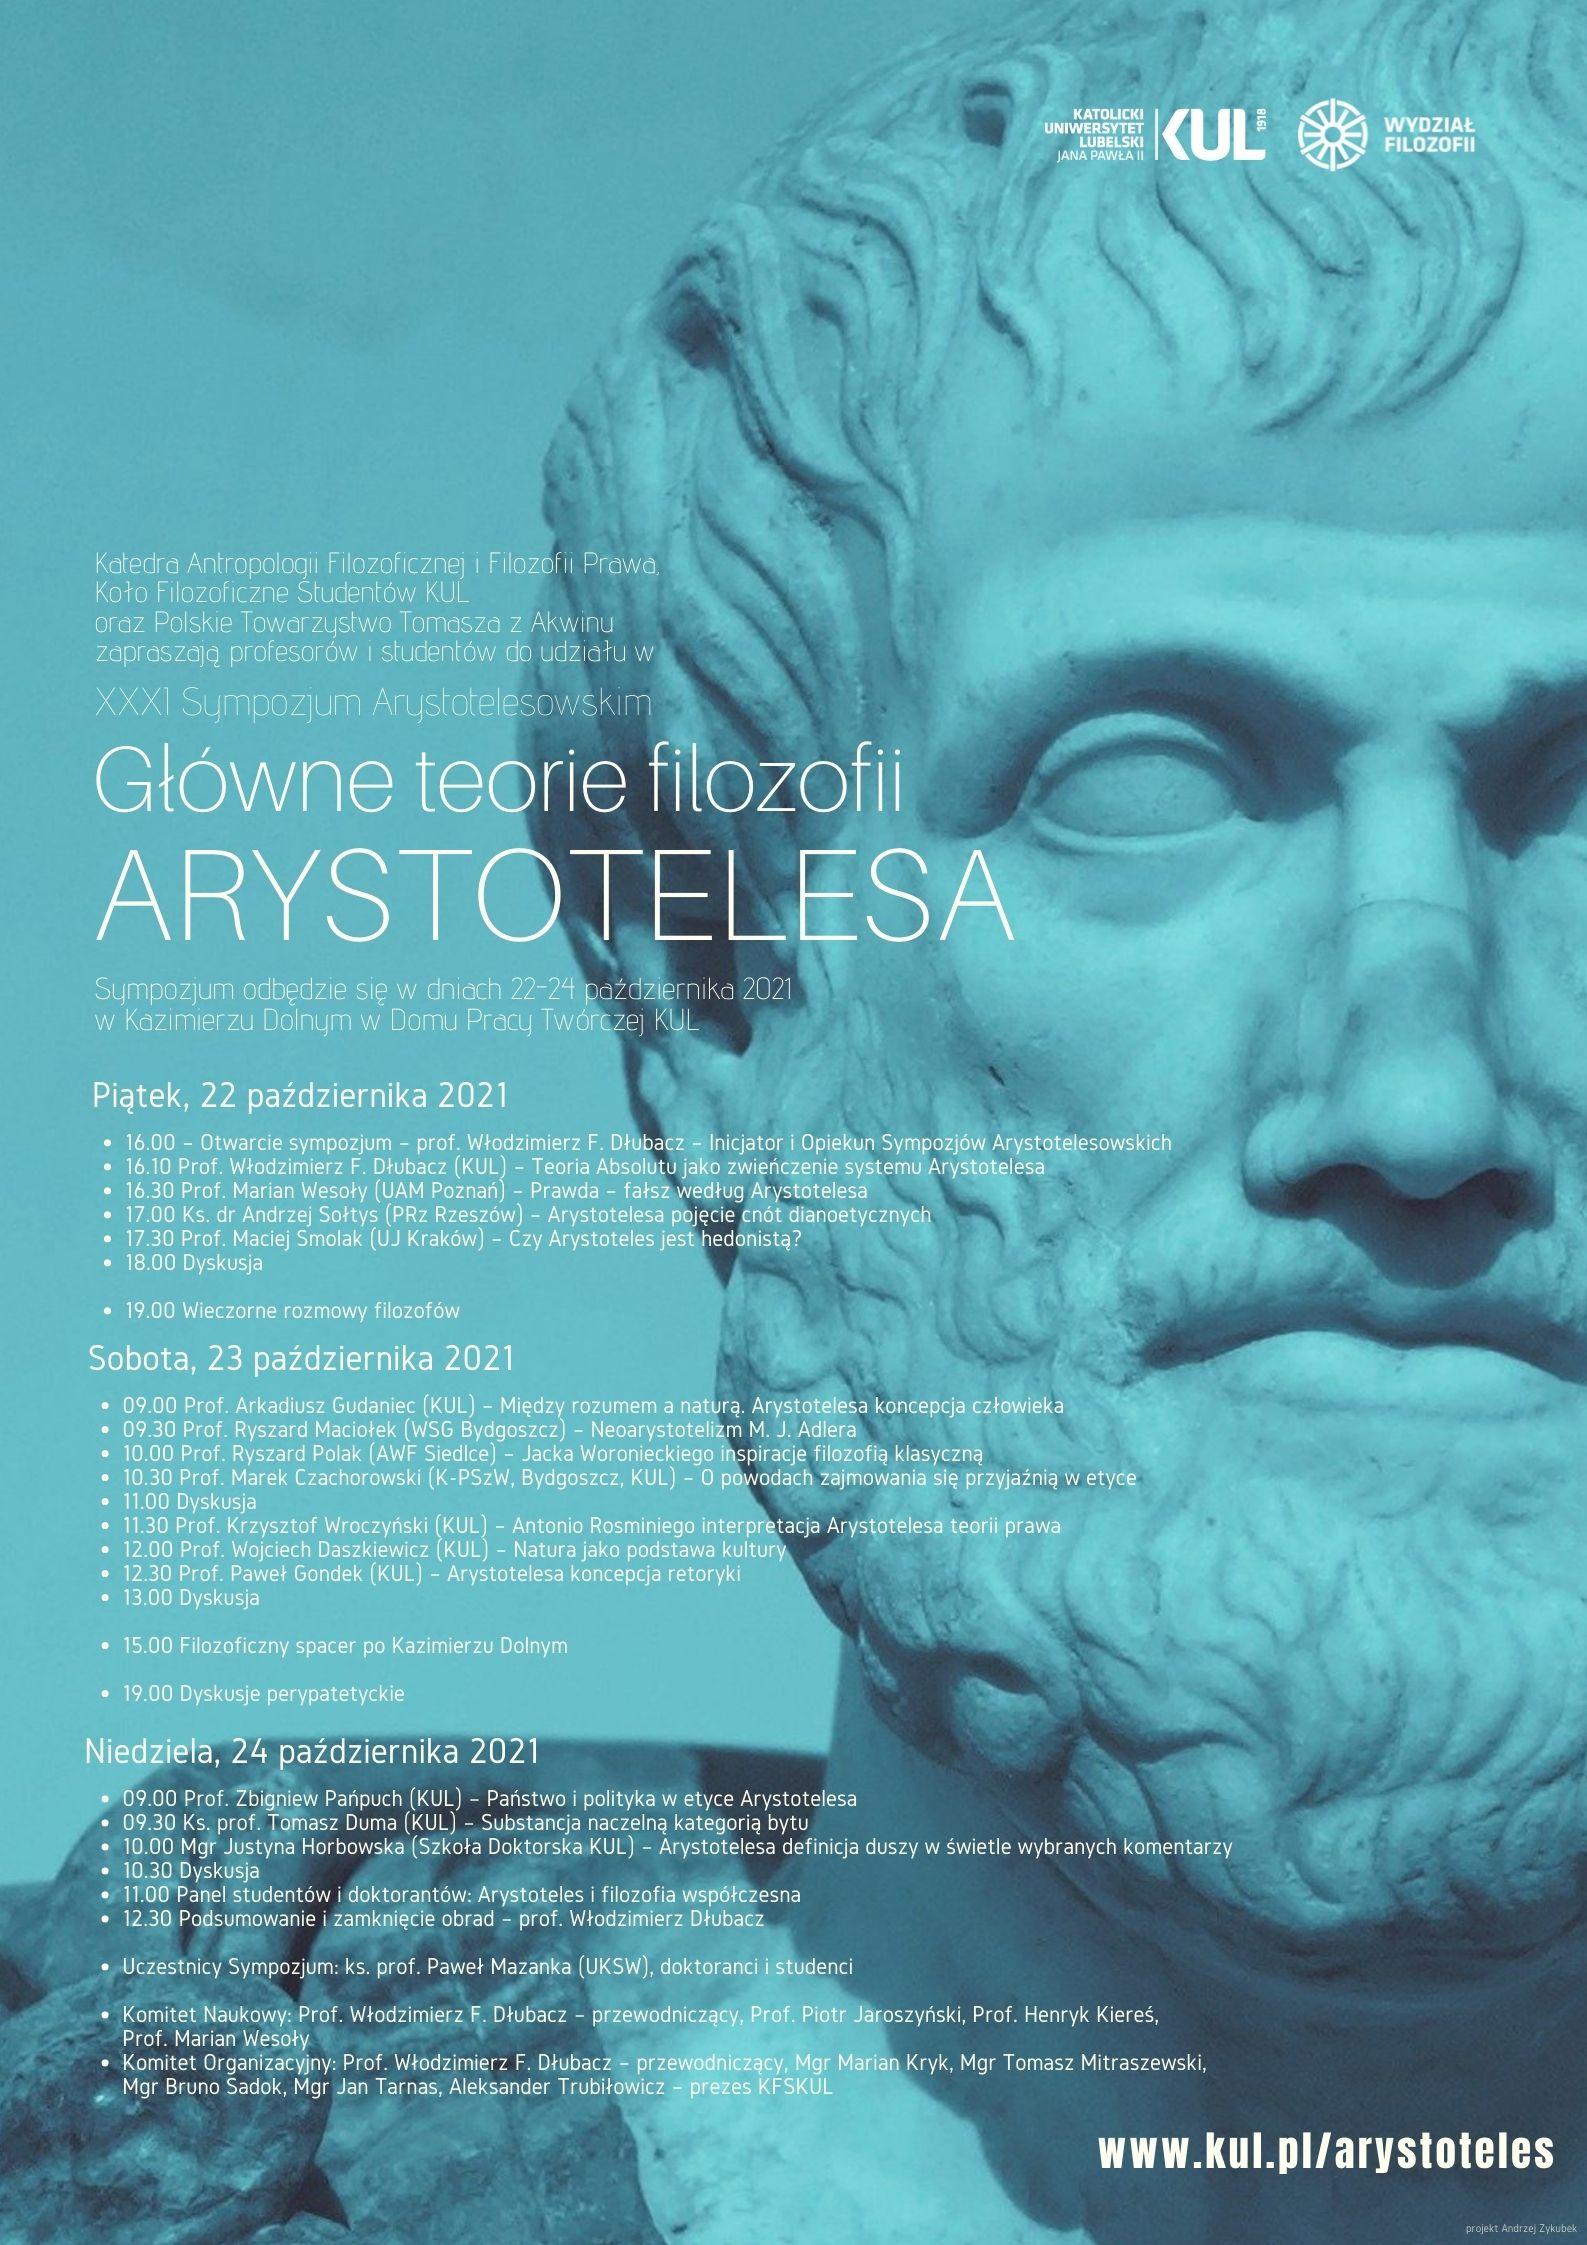 2021 arystoteles plakat a3